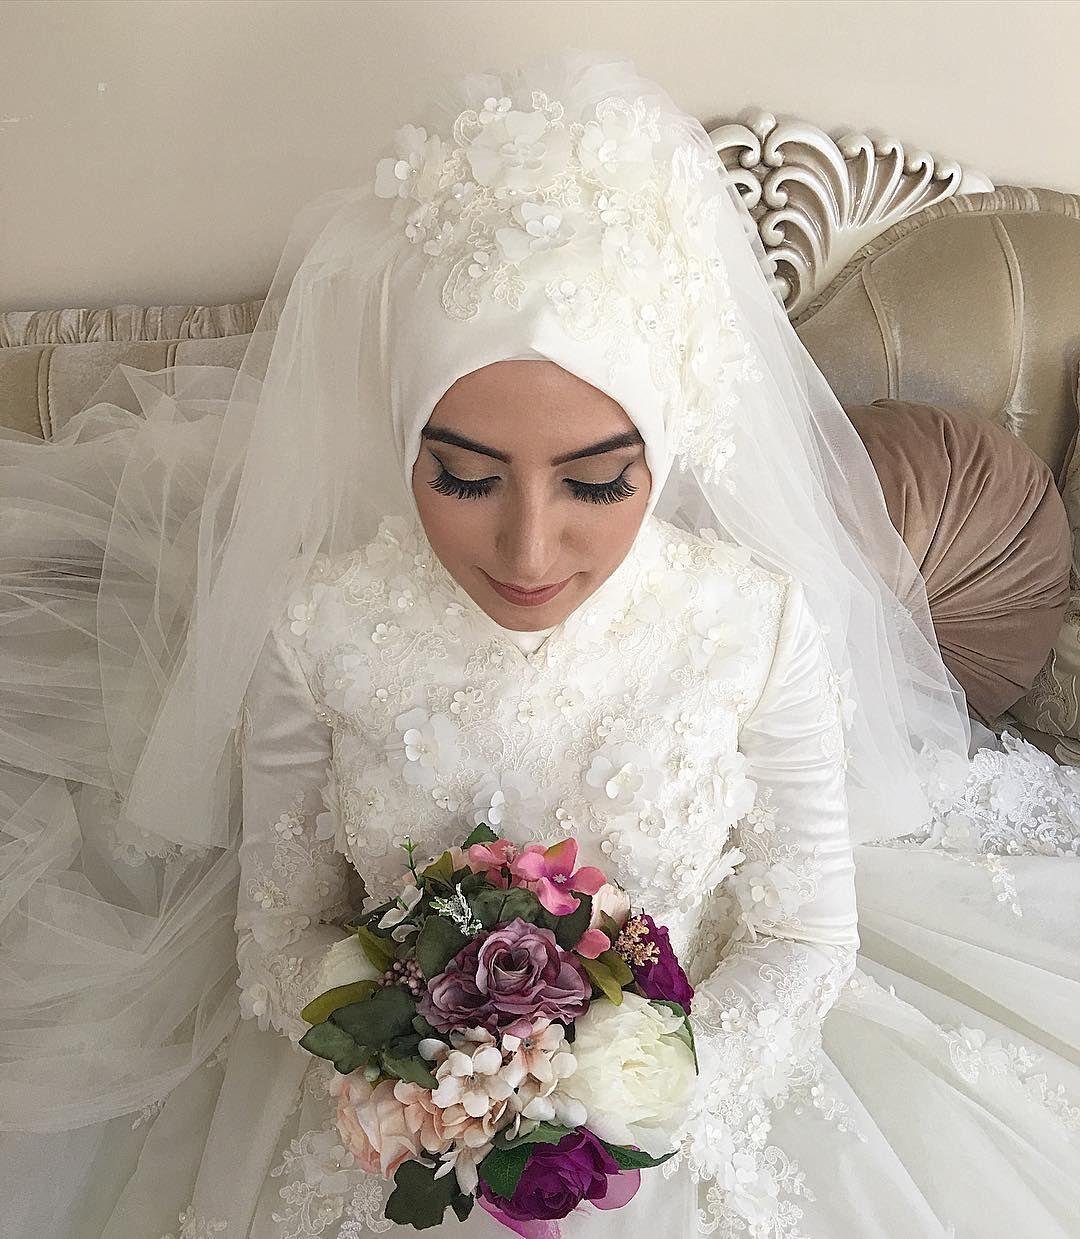 Pin by özlem özdemir on düğün pinterest muslim brides veil and